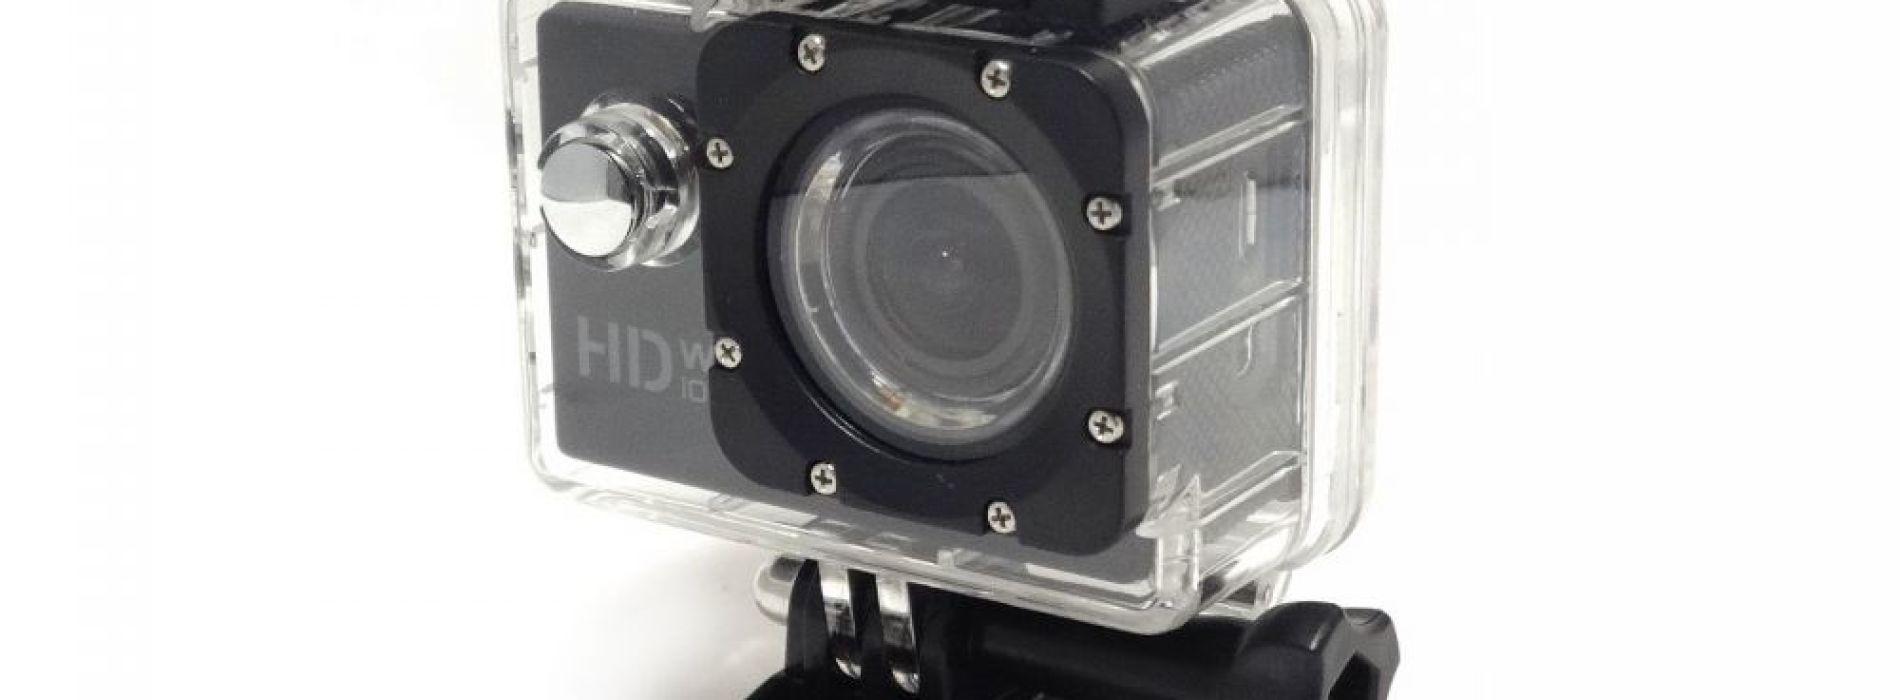 Ремонт экшн камер Falcon